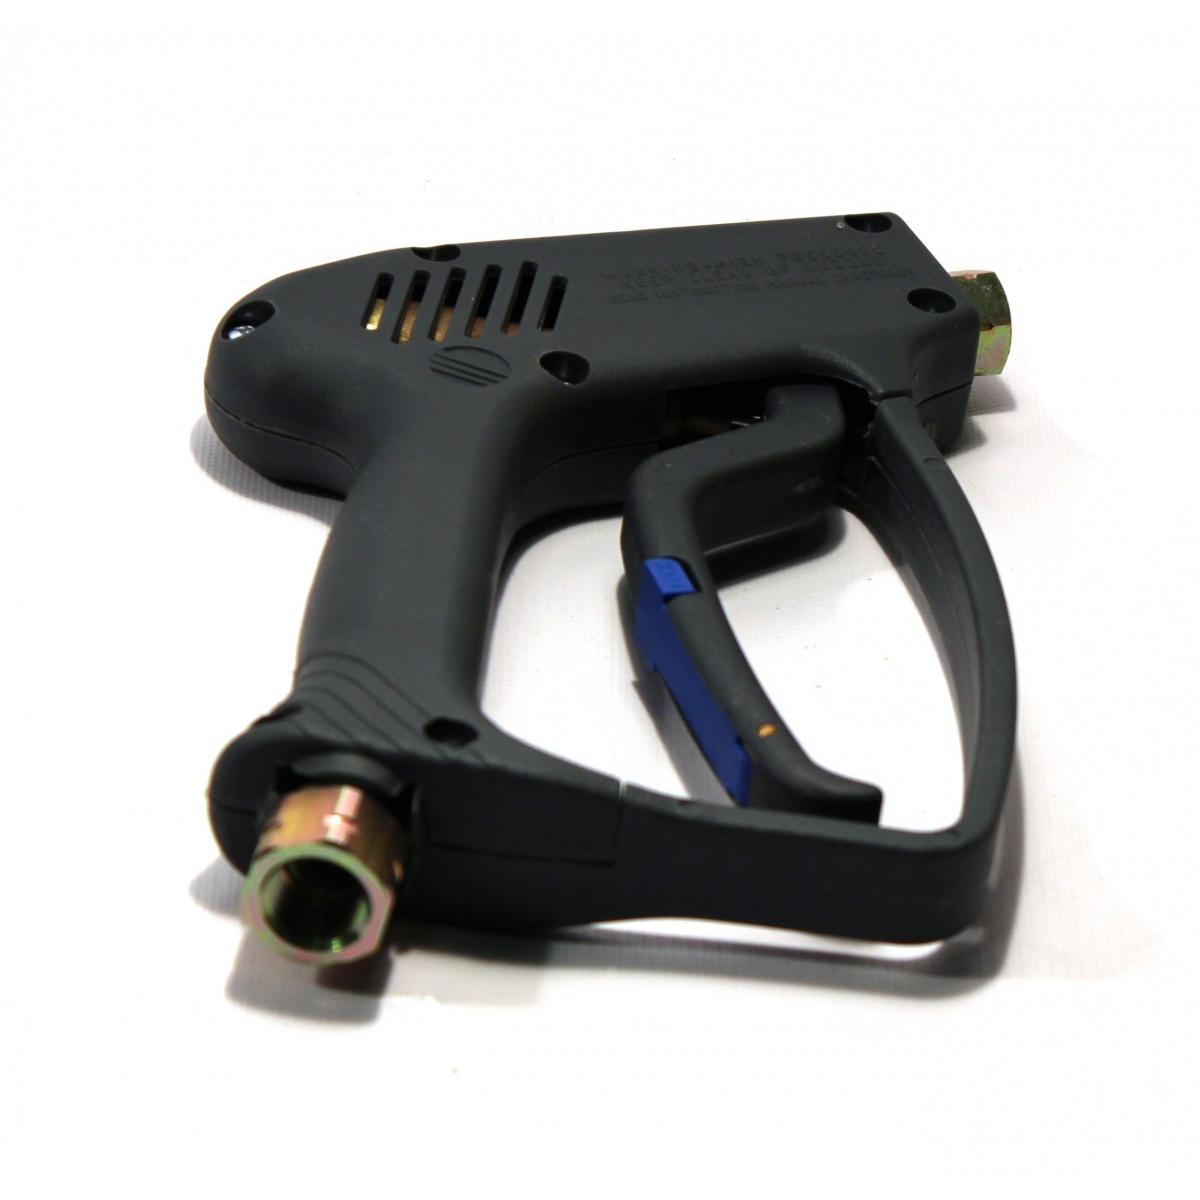 Gun, Legacy Industrial, 5000psi, 10.4gpm